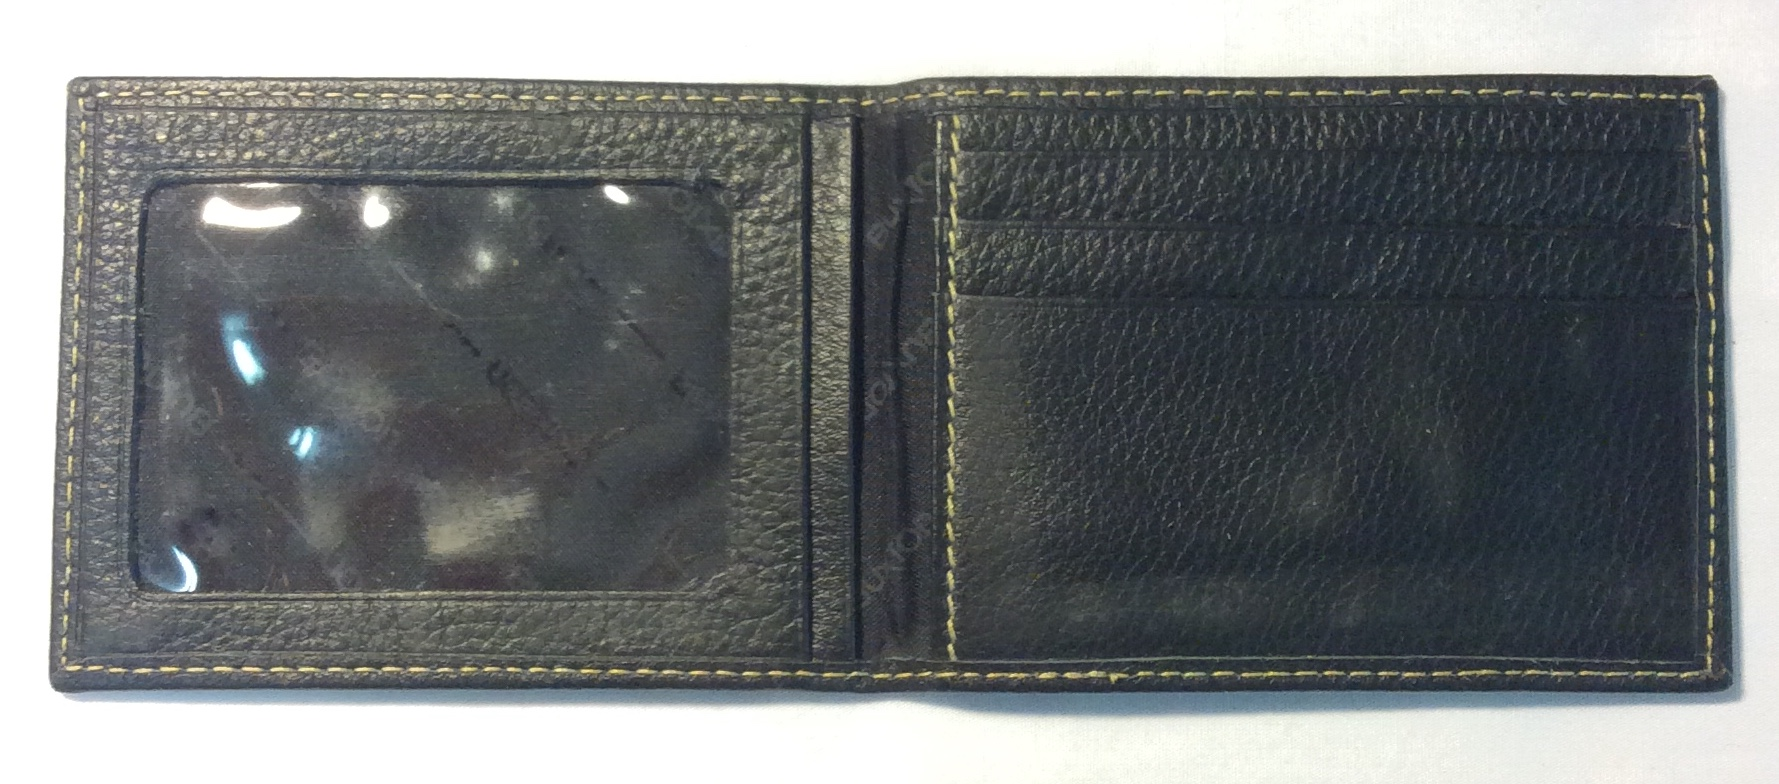 Buxton Black leather card holder